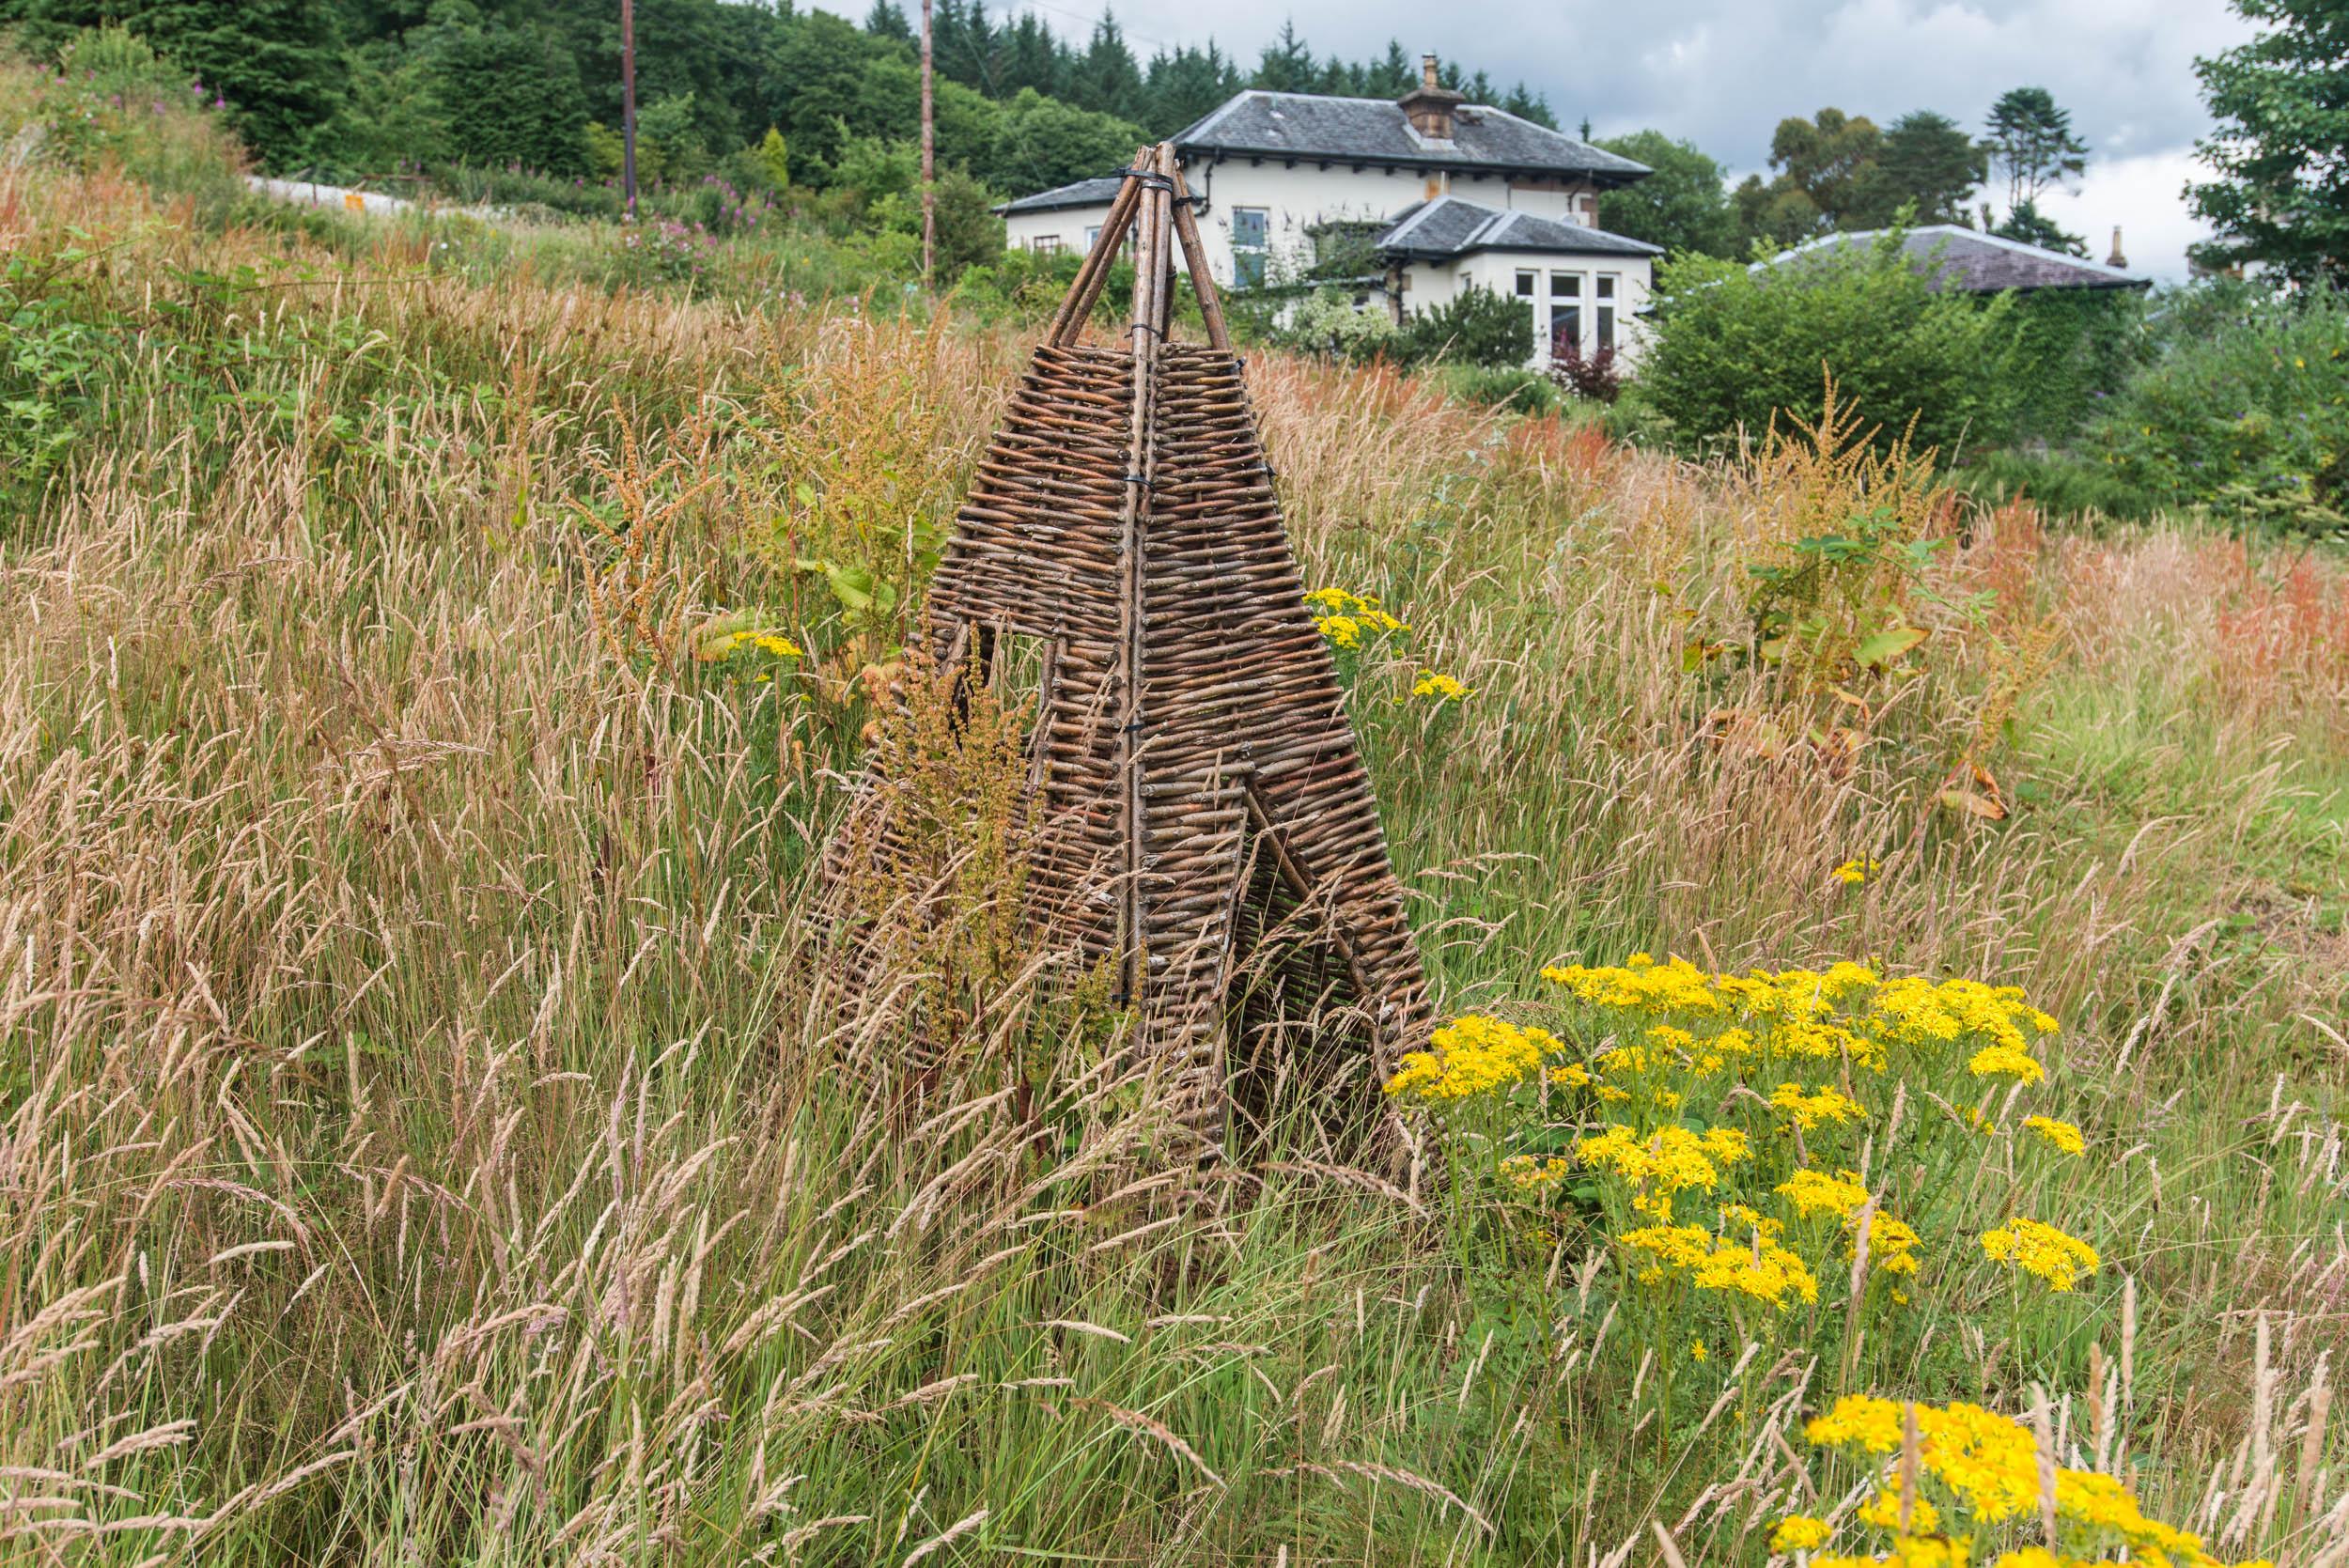 Blairmore-Gardens-2143.jpg